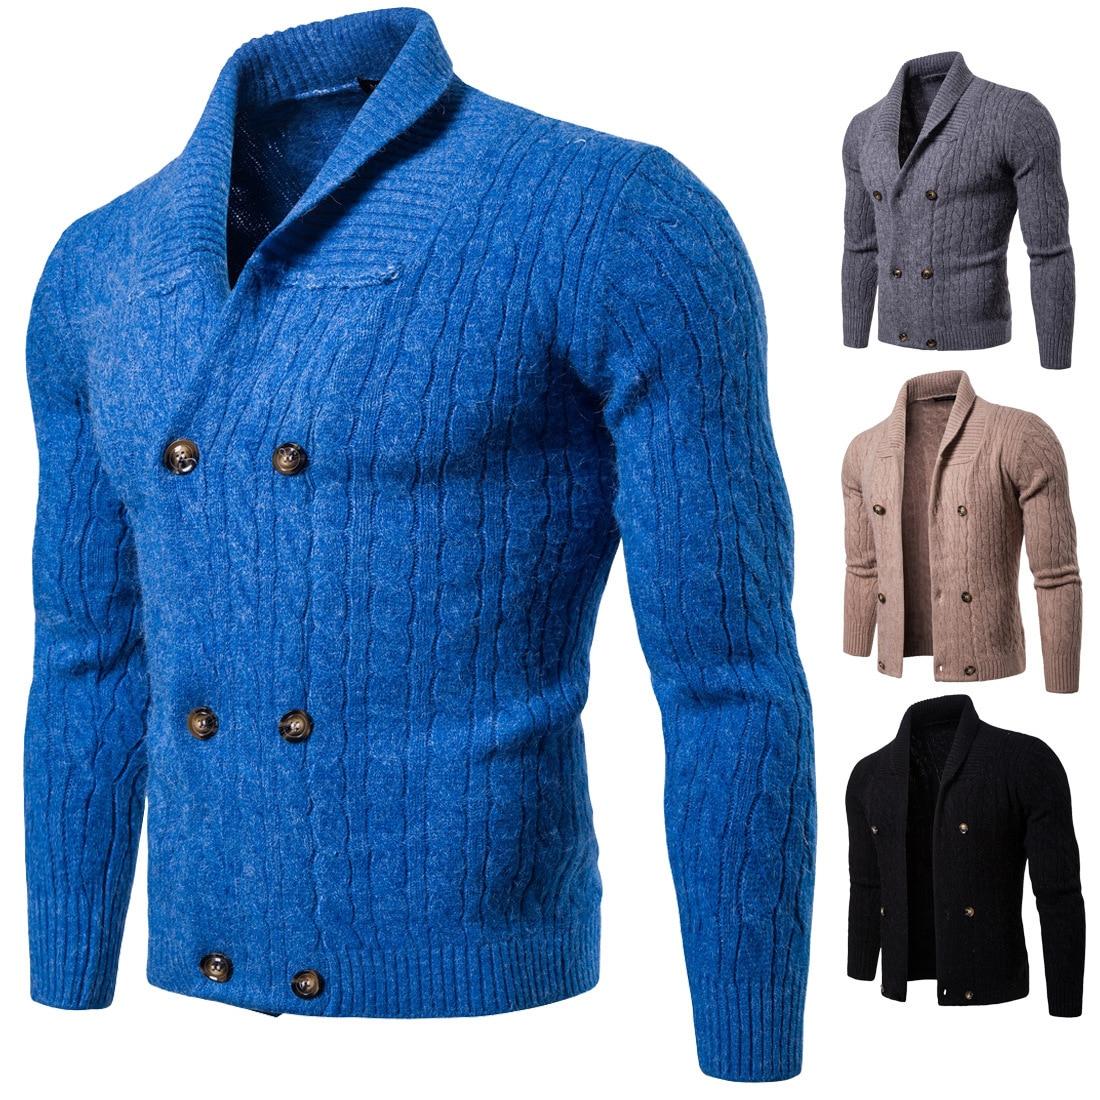 Men's Sweater, Fall/Winter Clothing,Men's Jacket,Sweater Male, Warm Winter Clothing Male,Men's Clothing, Men Cardigan